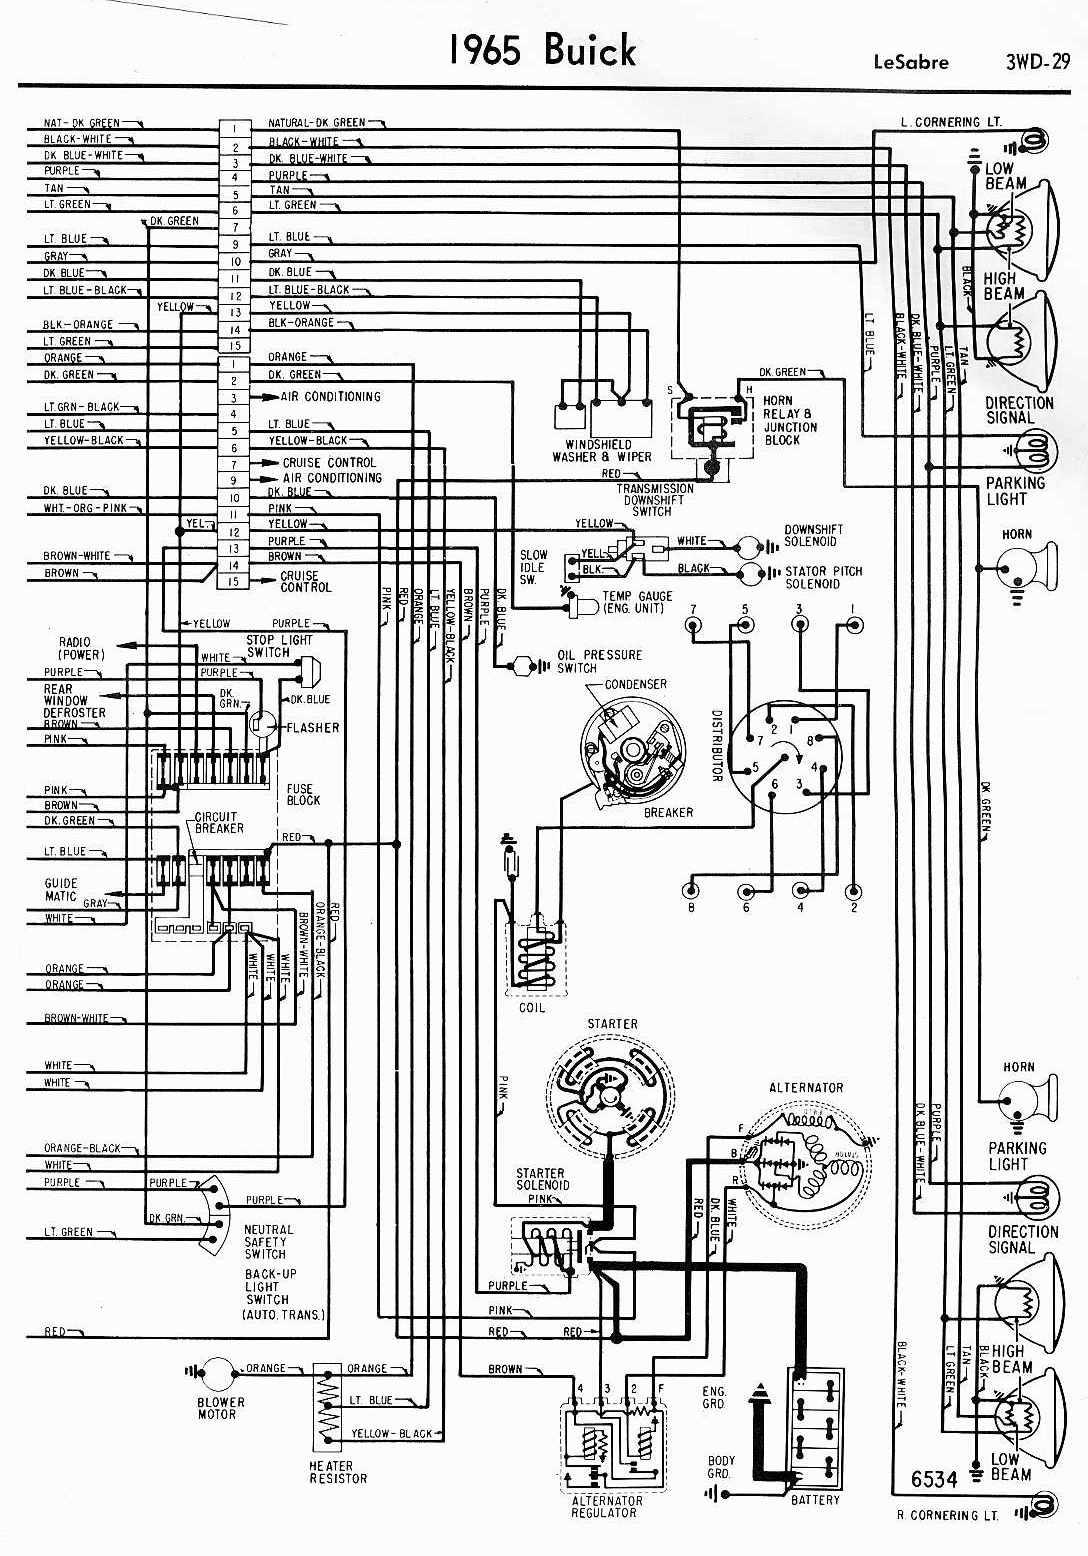 Cj3a Wiring Electrical Diagram Schematics Cj3b Harness 19 Images Diagrams